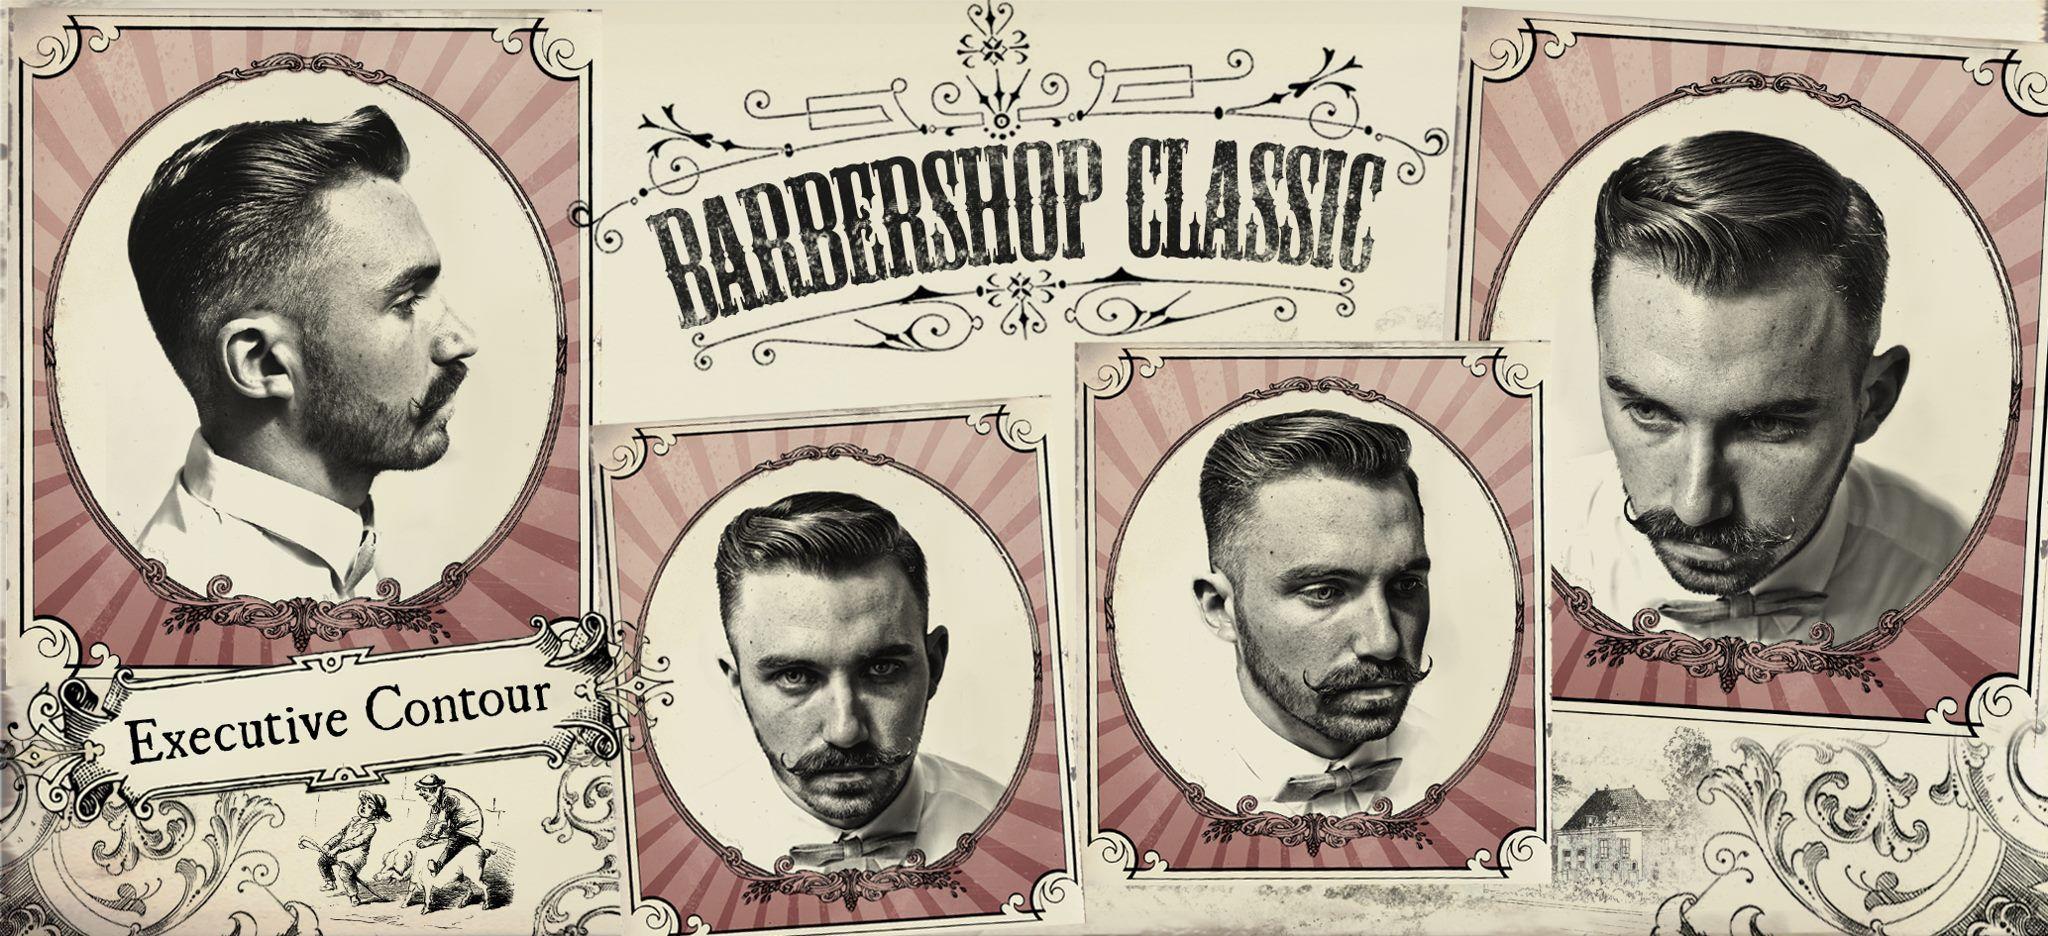 The Executive Contour Signature Haircuts Barbershop Classics